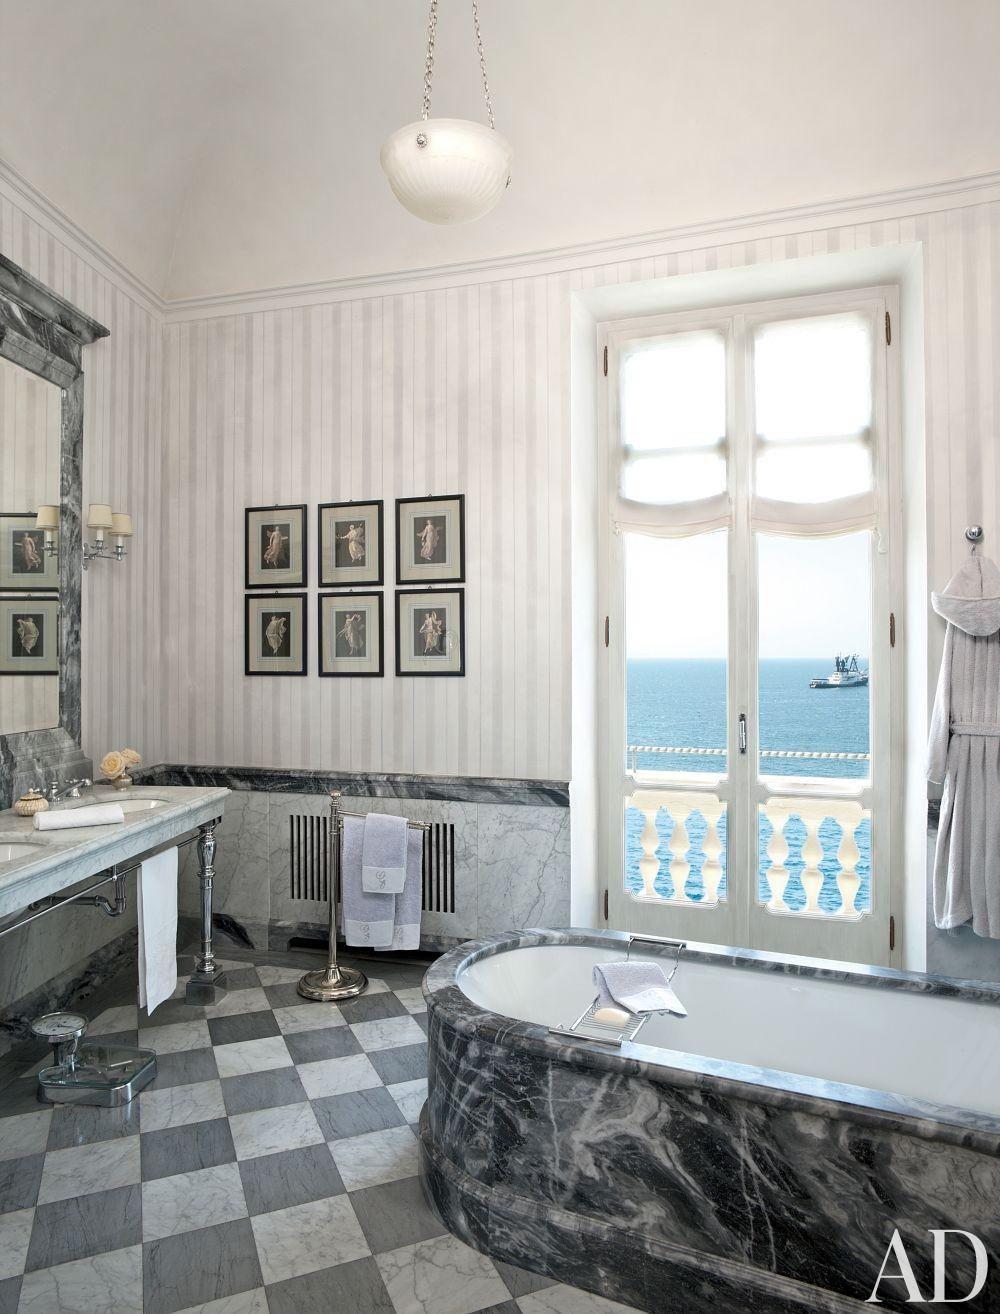 Traditional Bathroom by Studio Peregalli in Naples, Italy